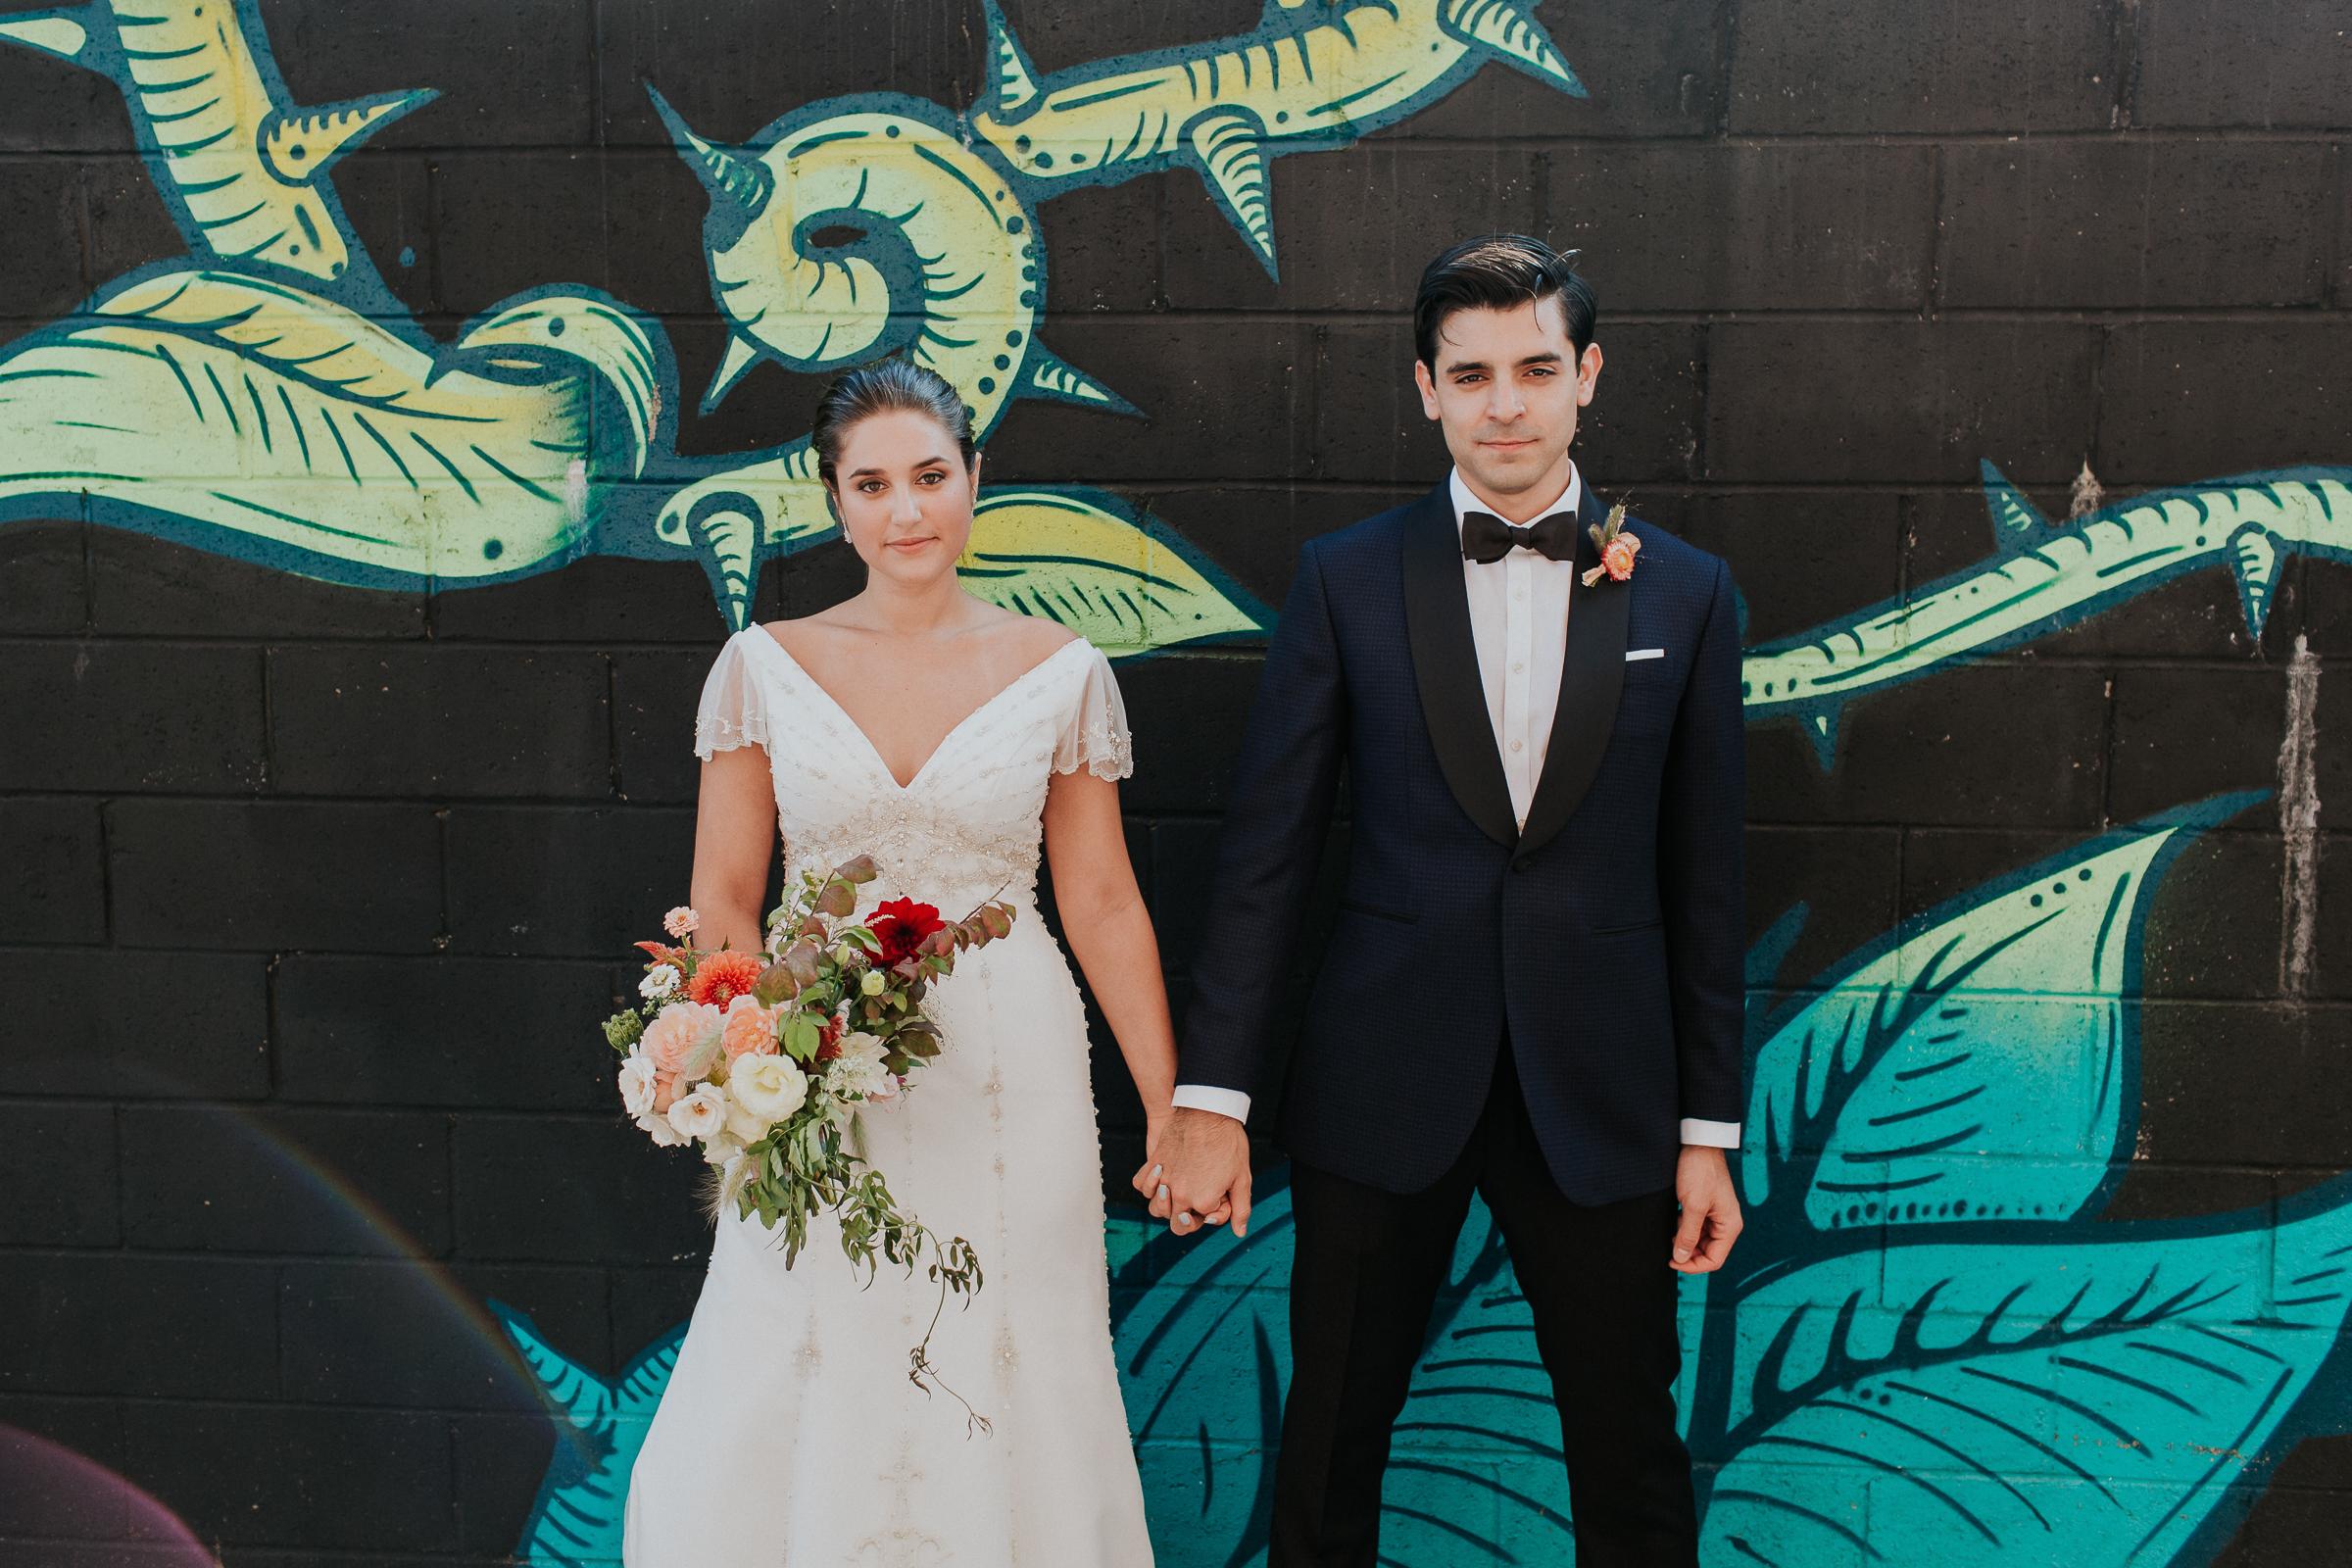 Brooklyn-Winery-NYC-Editorial-Documentary-Wedding-Photographer-Gina-Oli-42.jpg